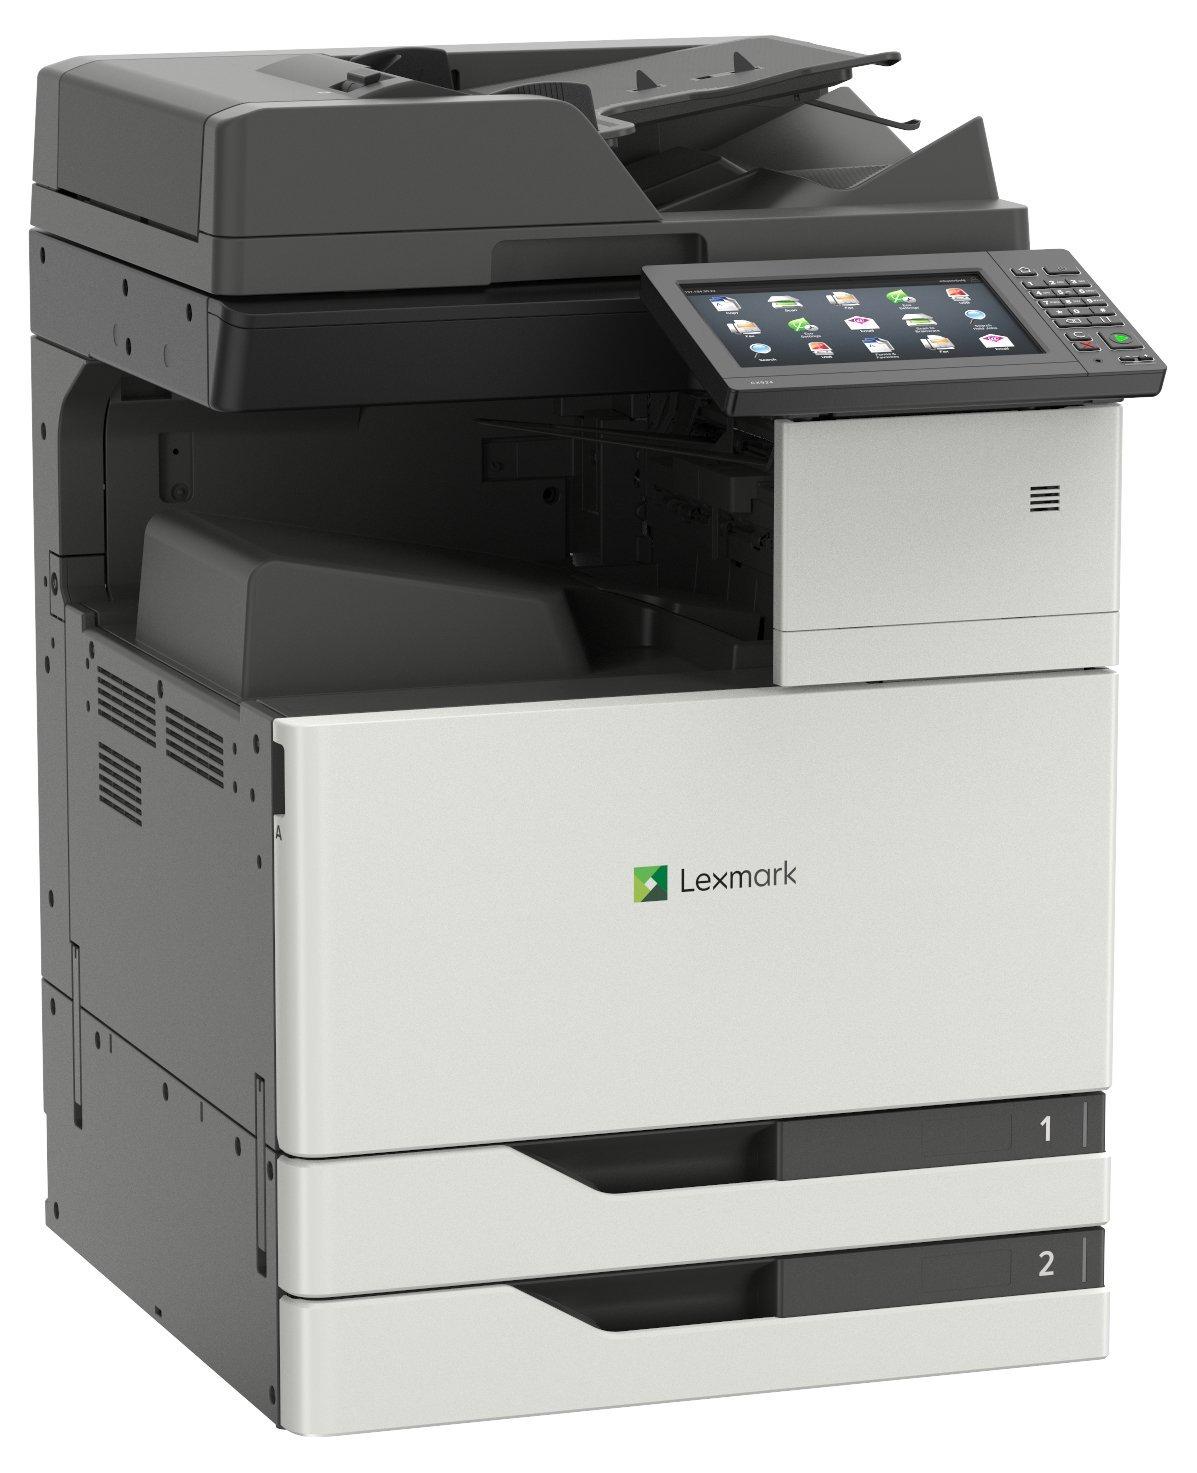 Lexmark XC9245de Laser 45 ppm 1200 x 1200 dpi A3 - Impresora ...